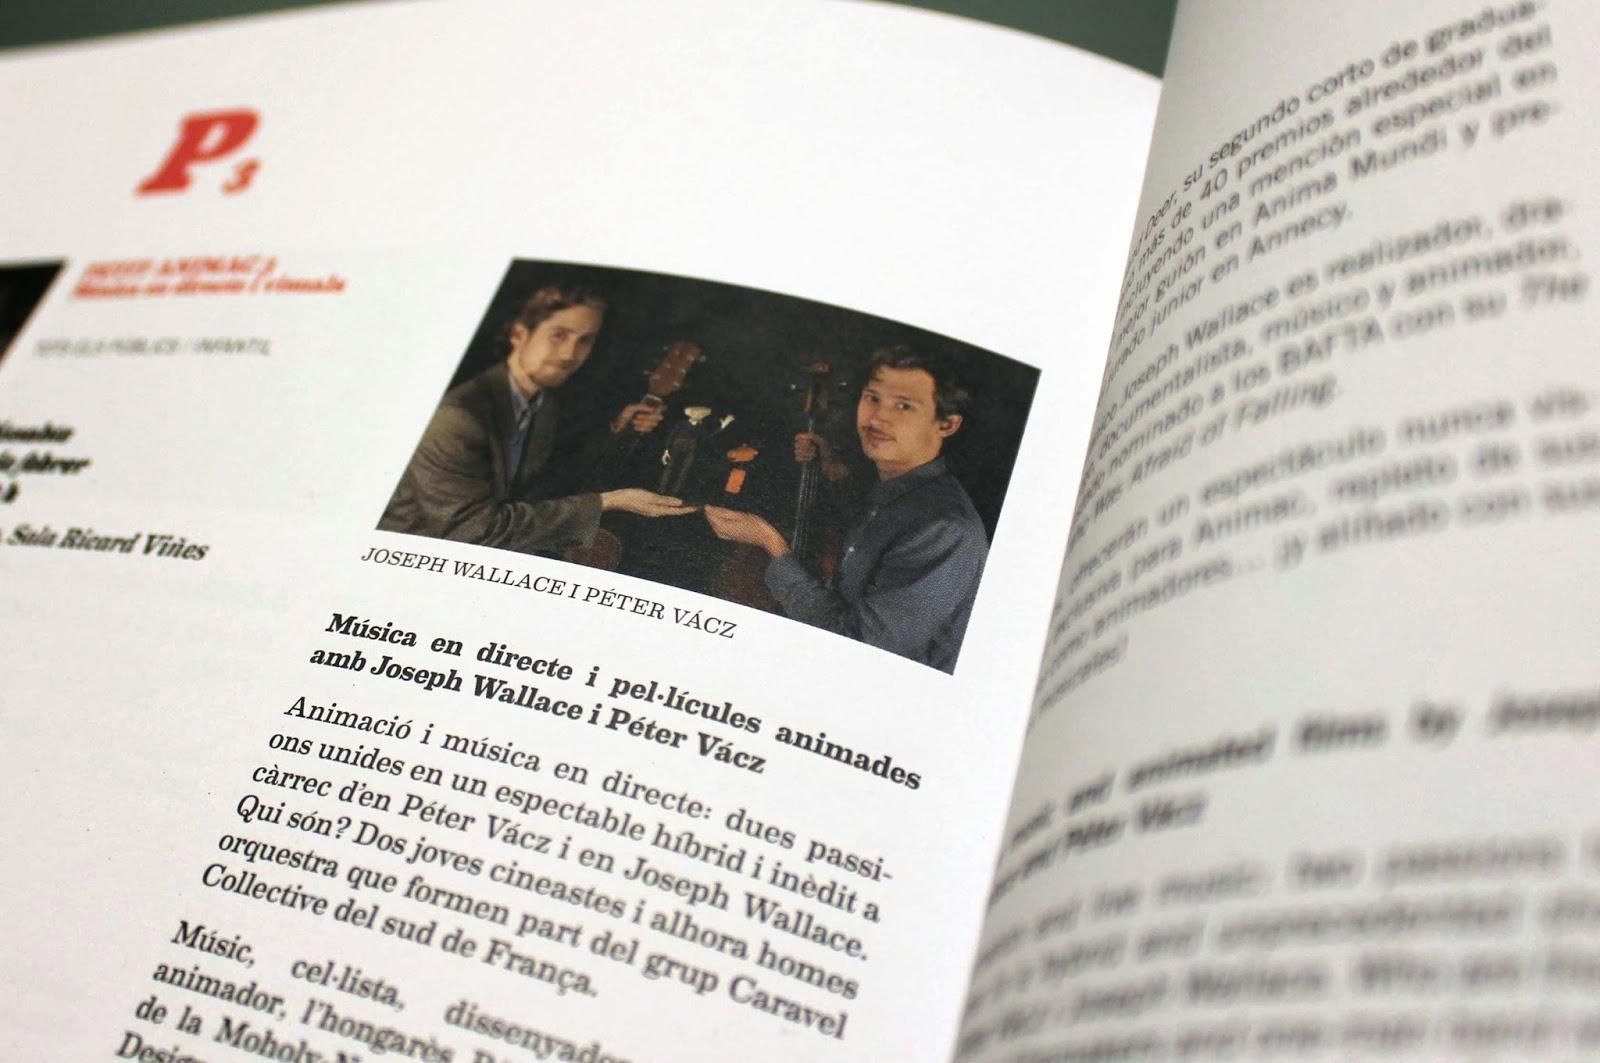 05+Animac+catalogue+Joseph+Wallace.jpg